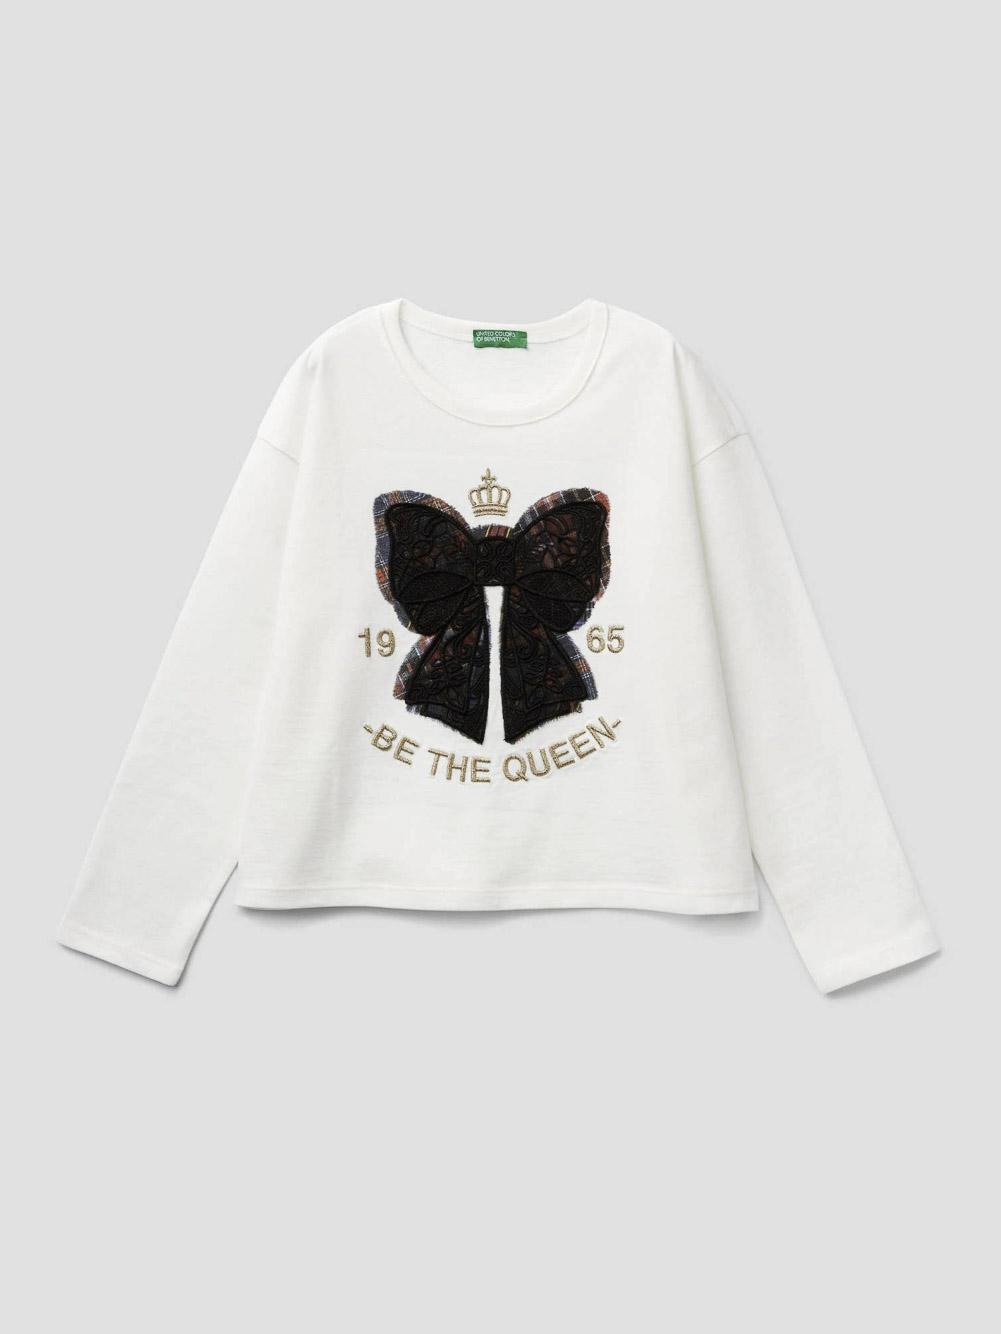 012 BENETTON T-shirt με τύπωμα και κέντημα 3VR5C14SO 20A074